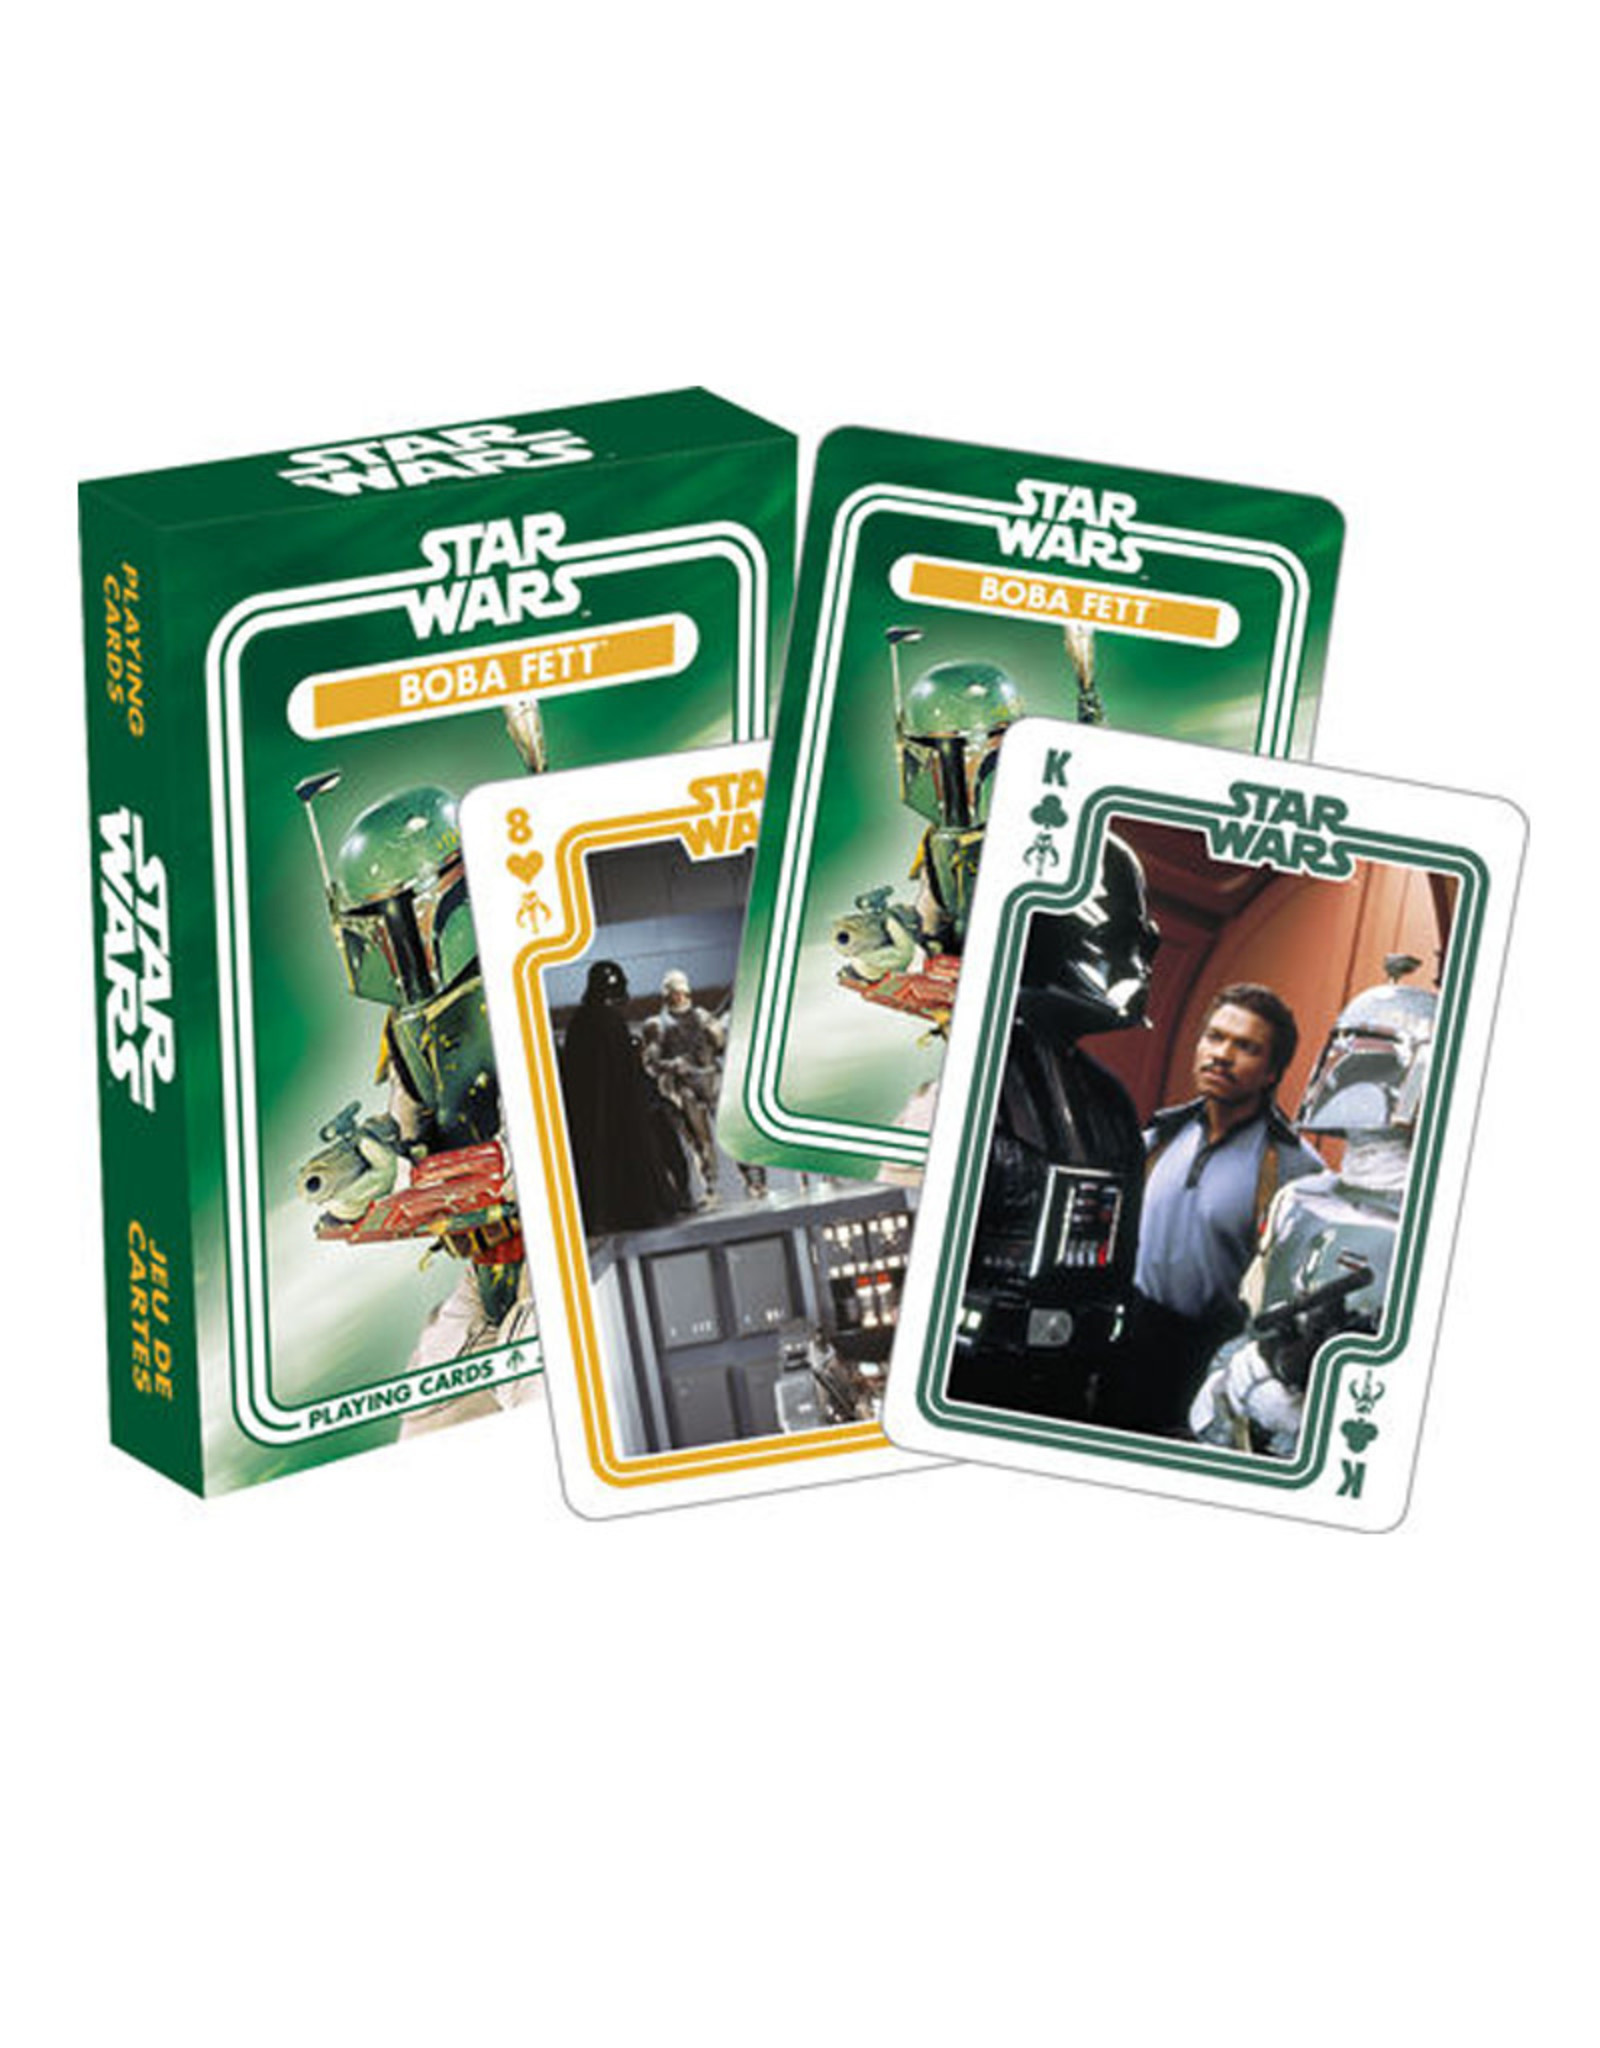 Star Wars Star Wars ( Playing cards ) Boba Fett